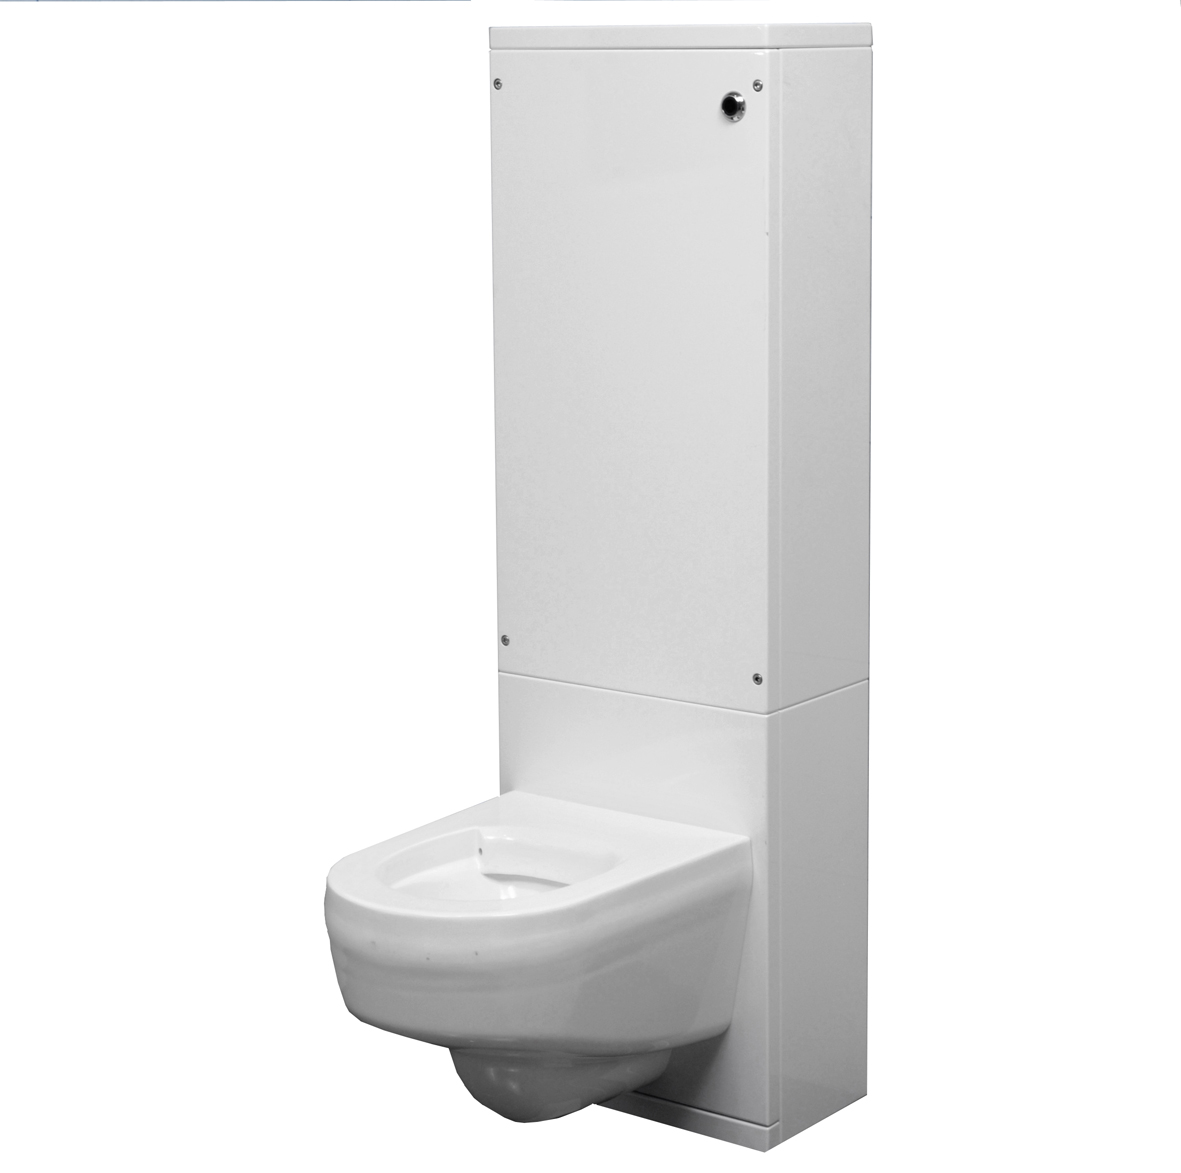 Heno WC modul (Vägg-Plan)